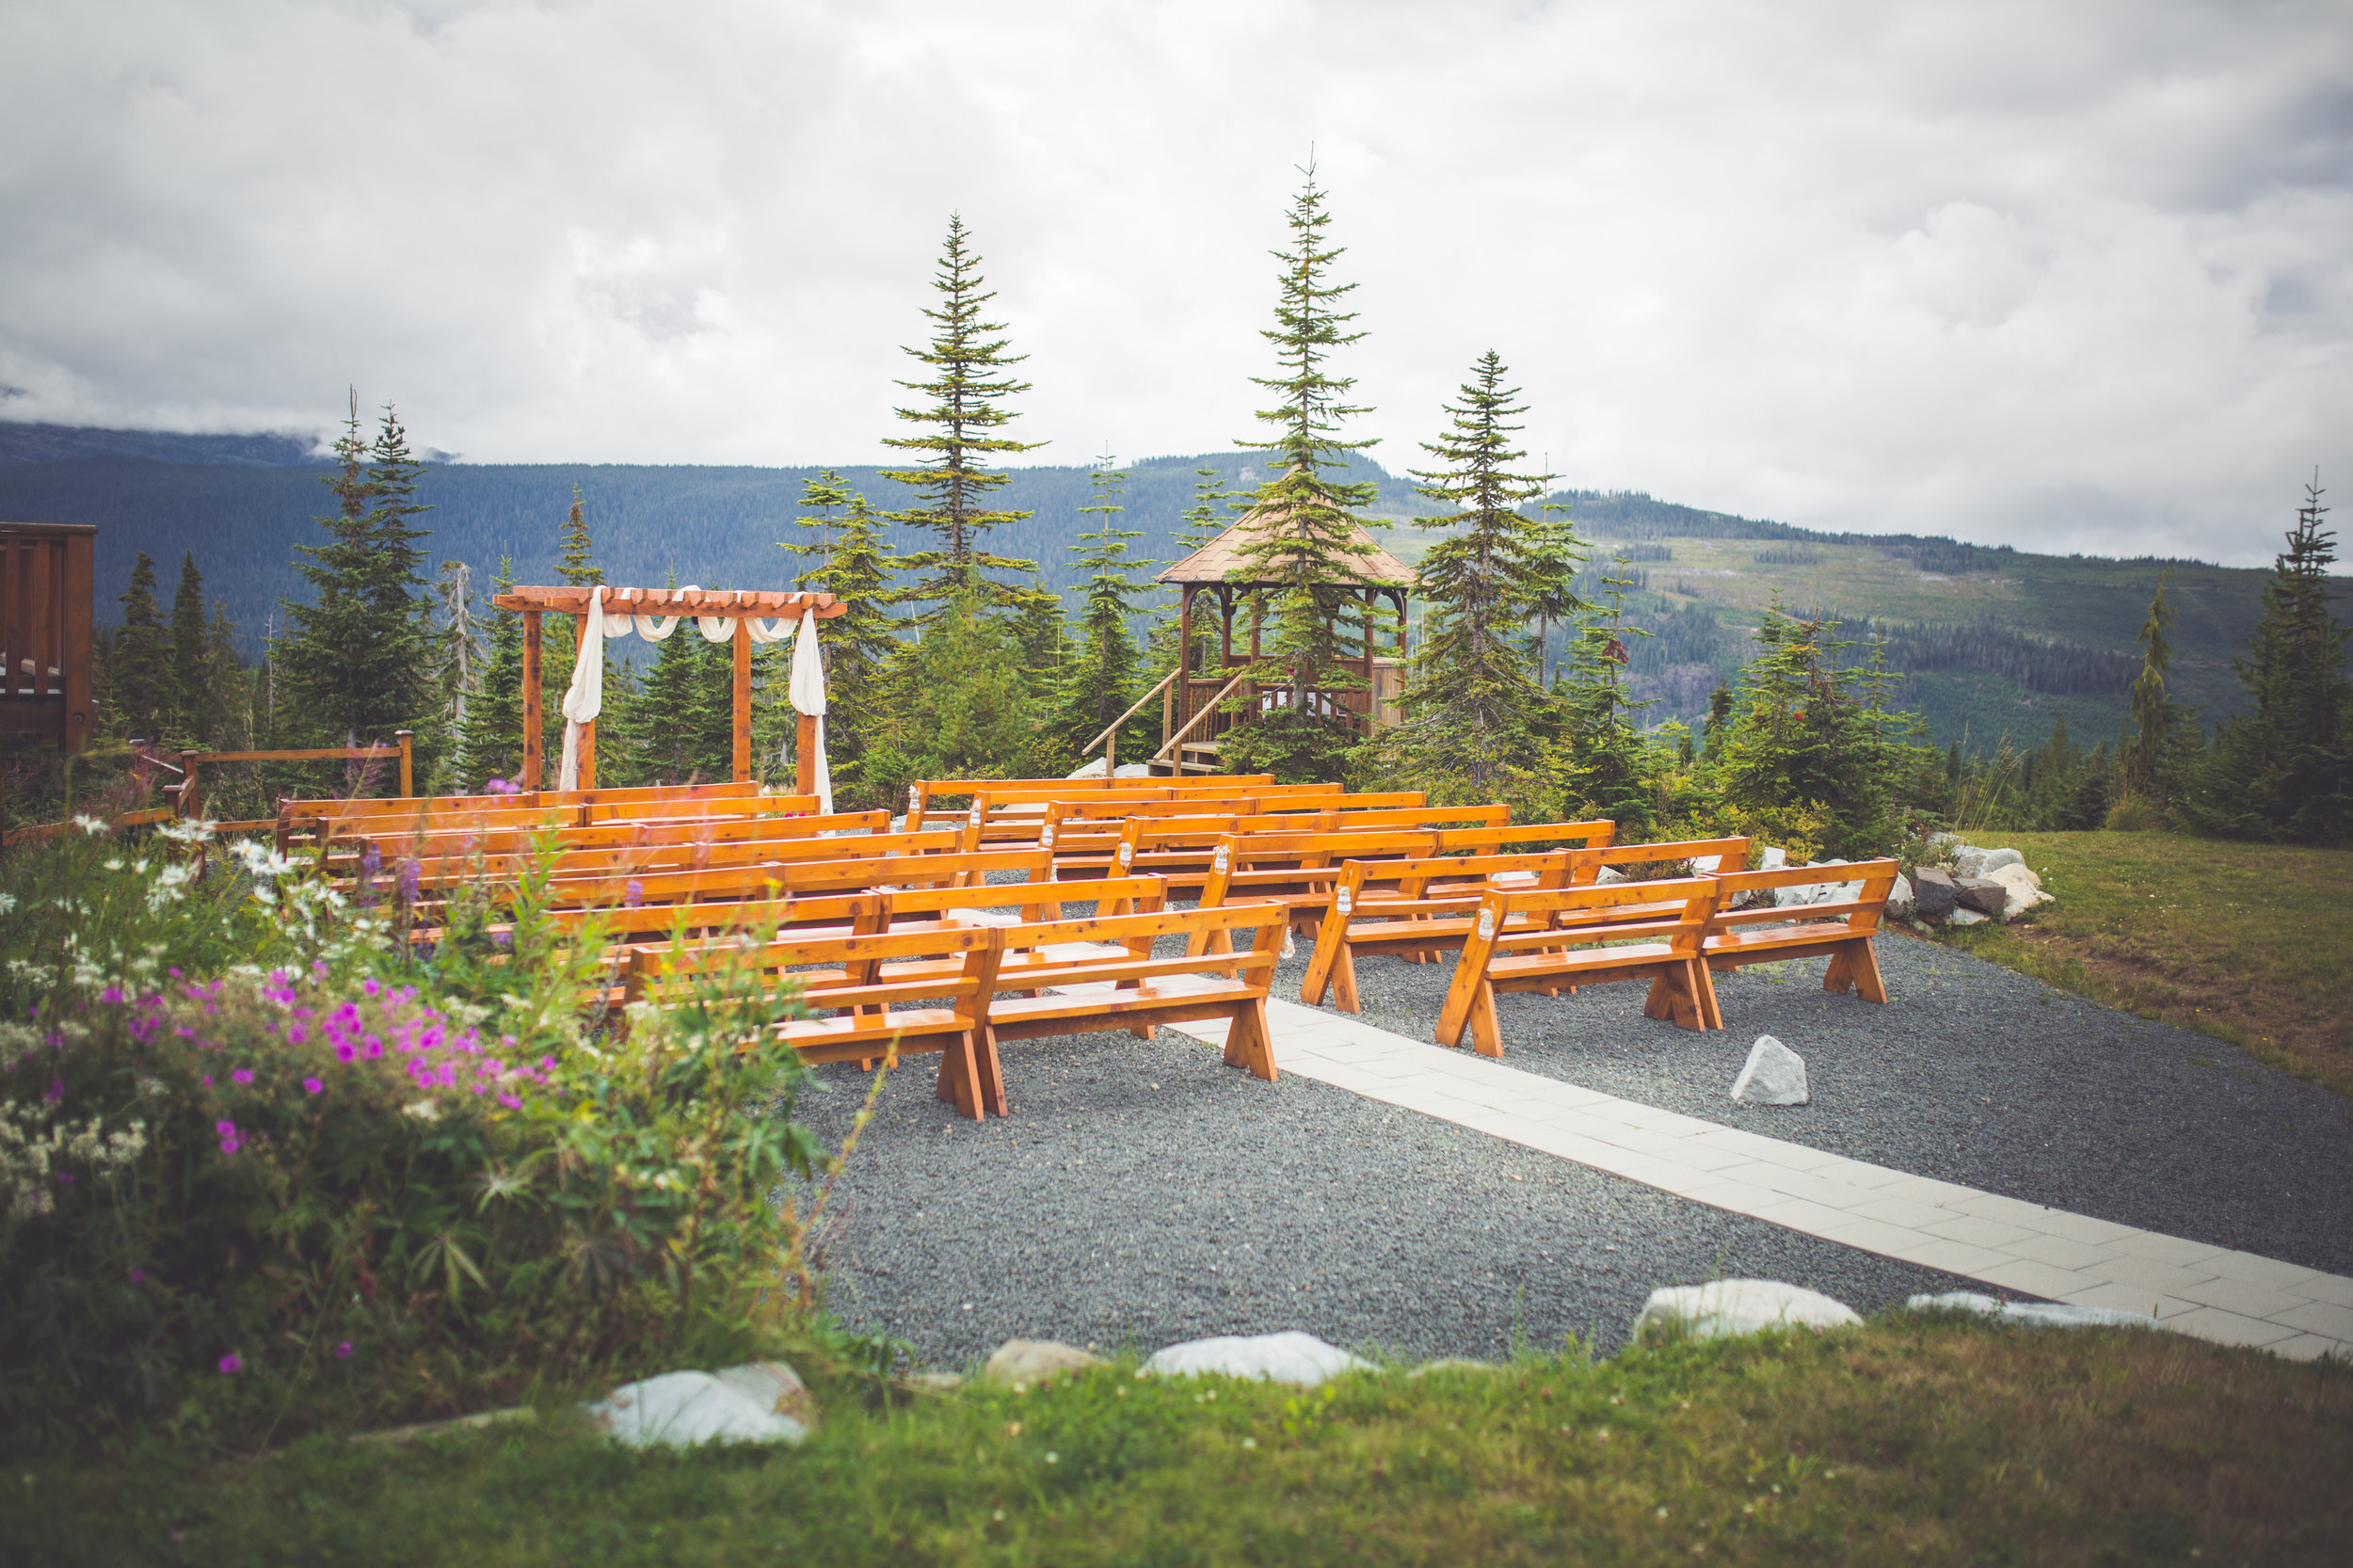 mount washington resort wedding ceremony site